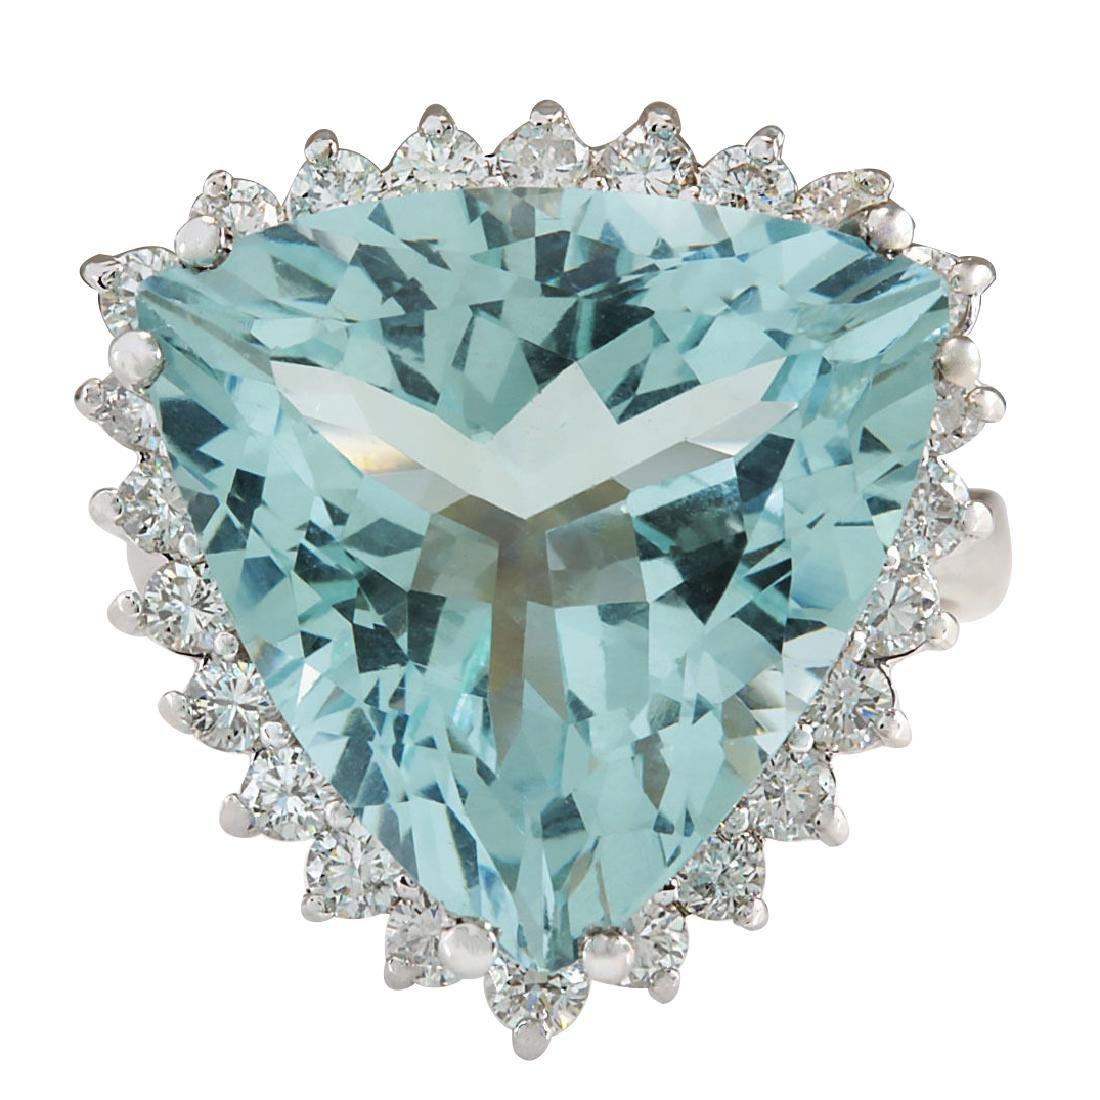 13.62CTW Natural Aquamarine And Diamond Ring In 18K